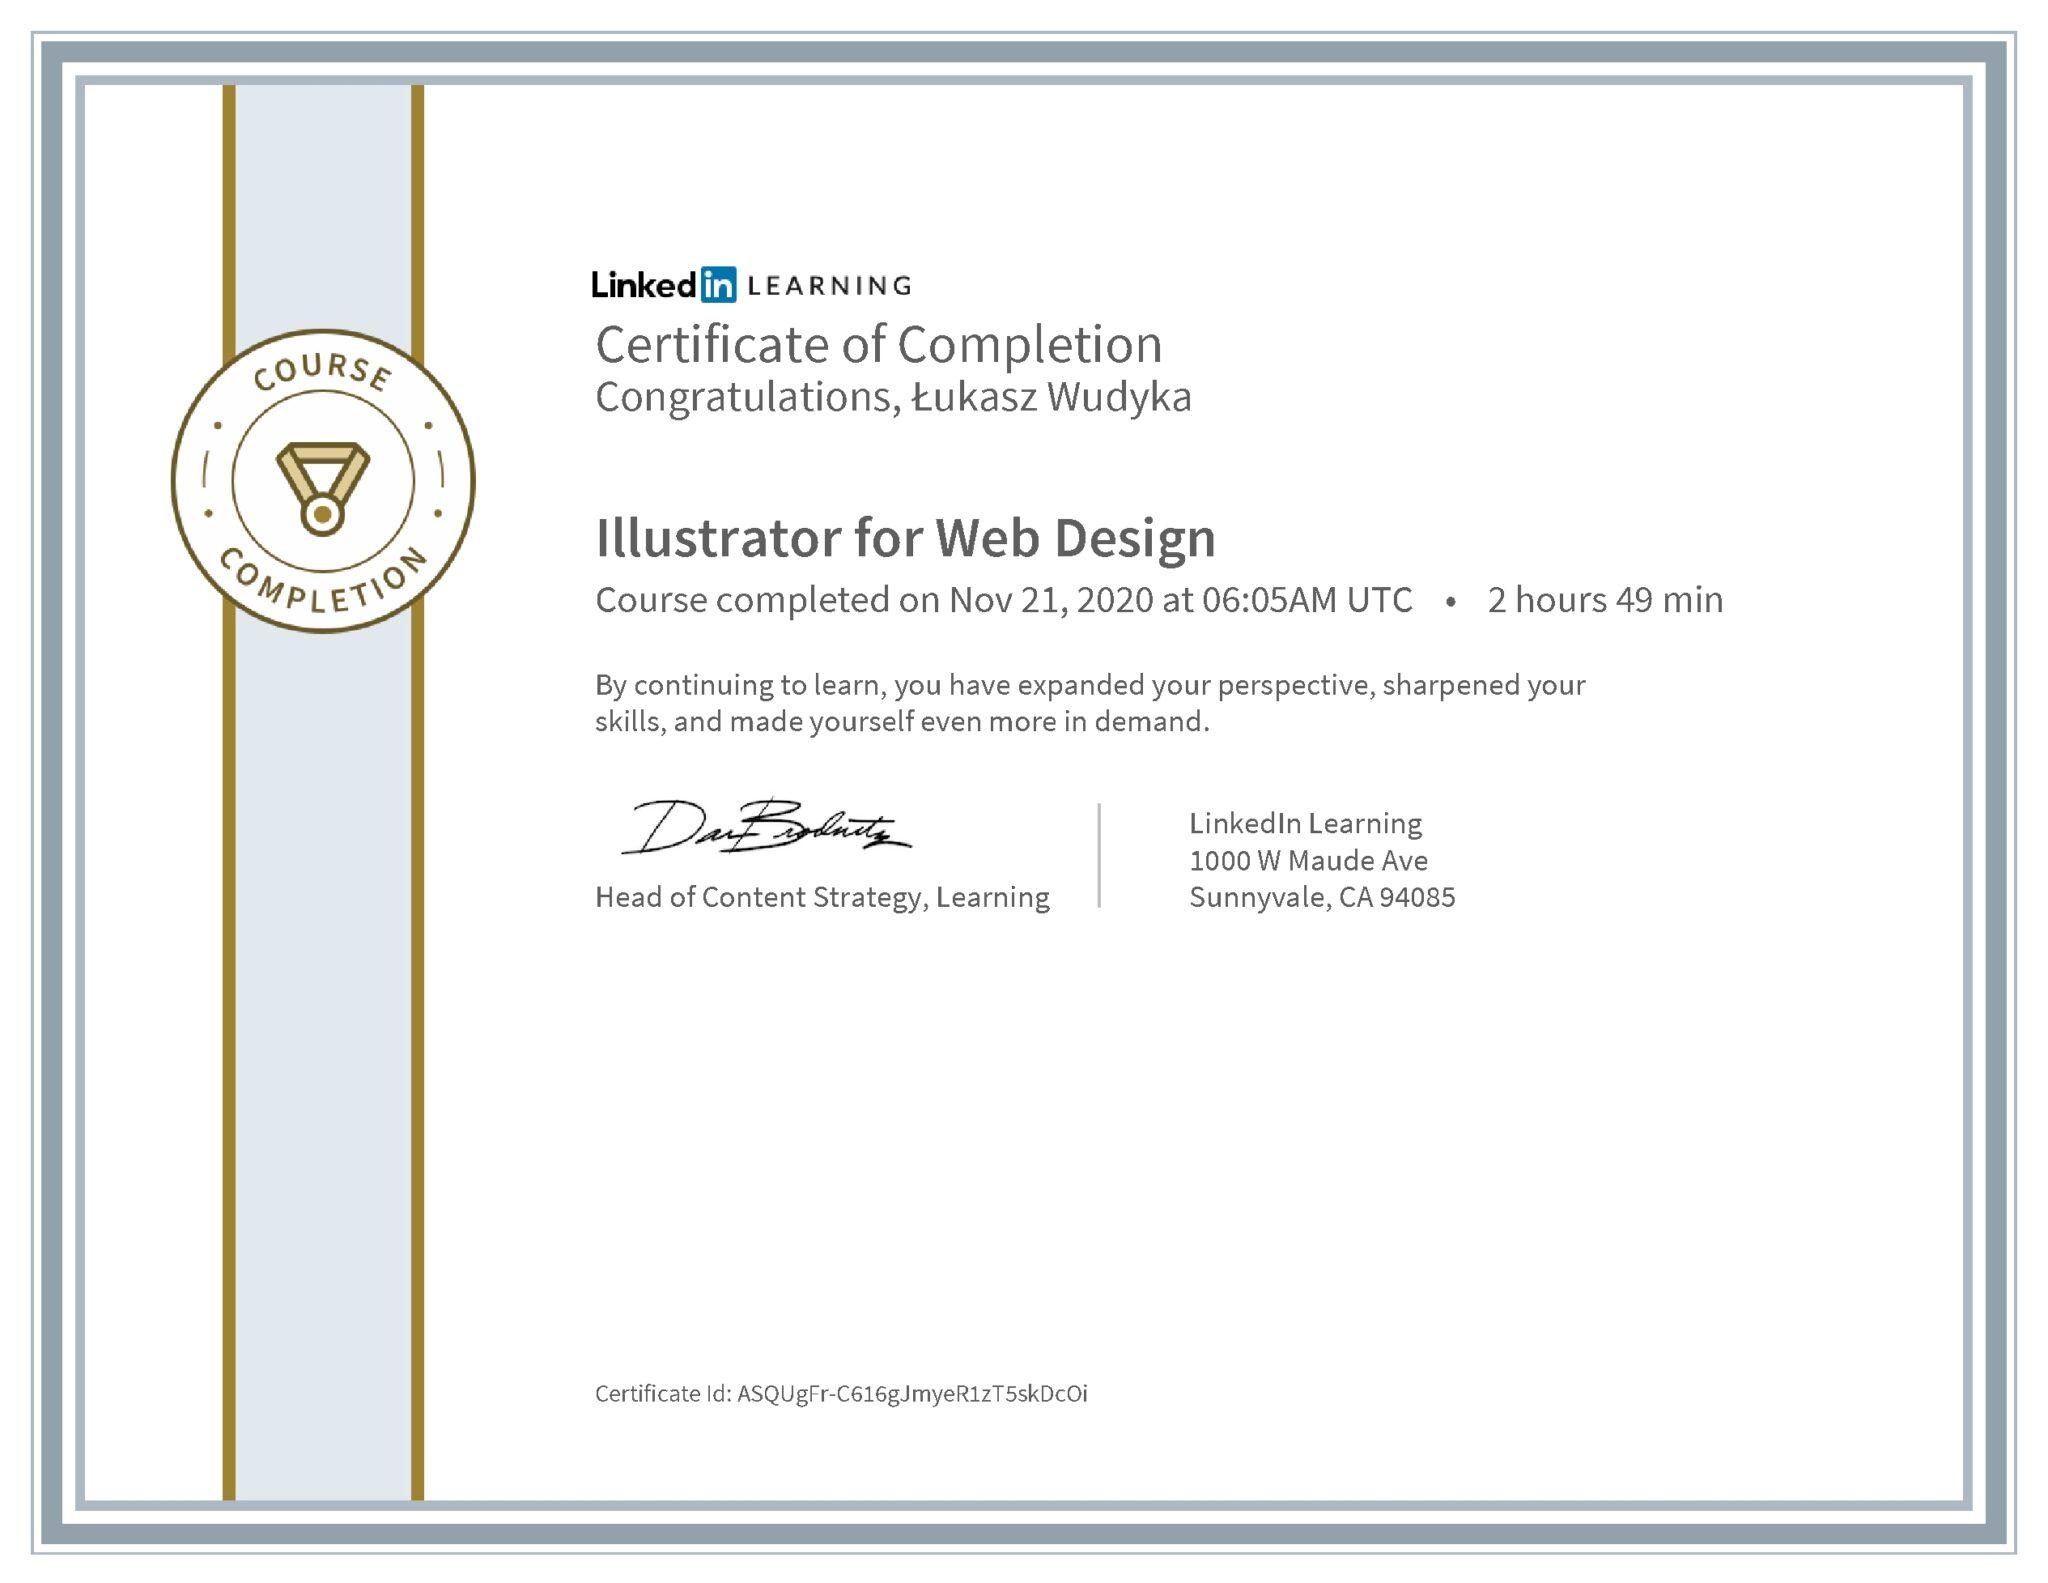 Łukasz Wudyka certyfikat LinkedIn Illustrator for Web Design